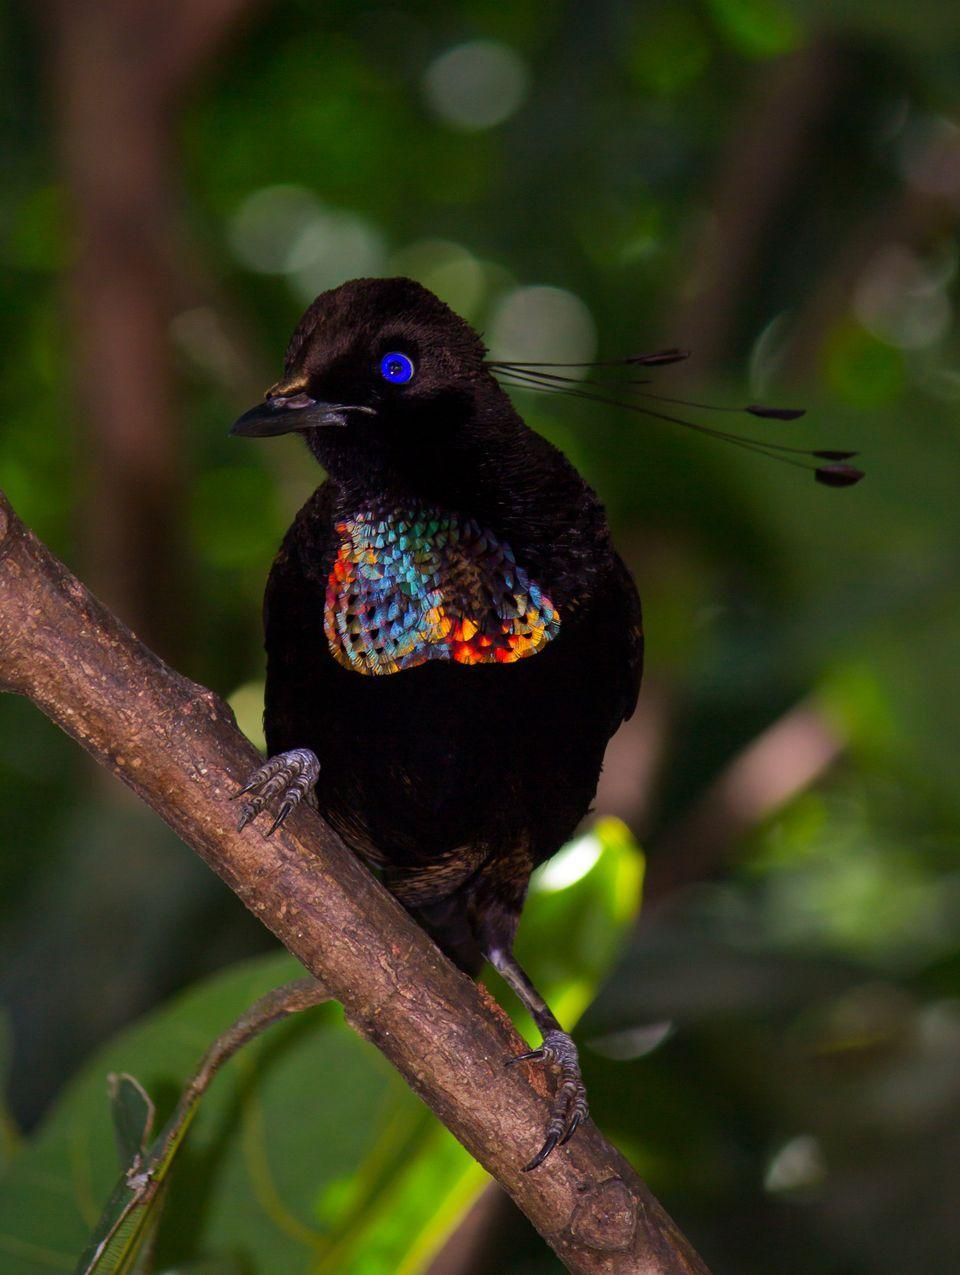 Birds of paradise hd